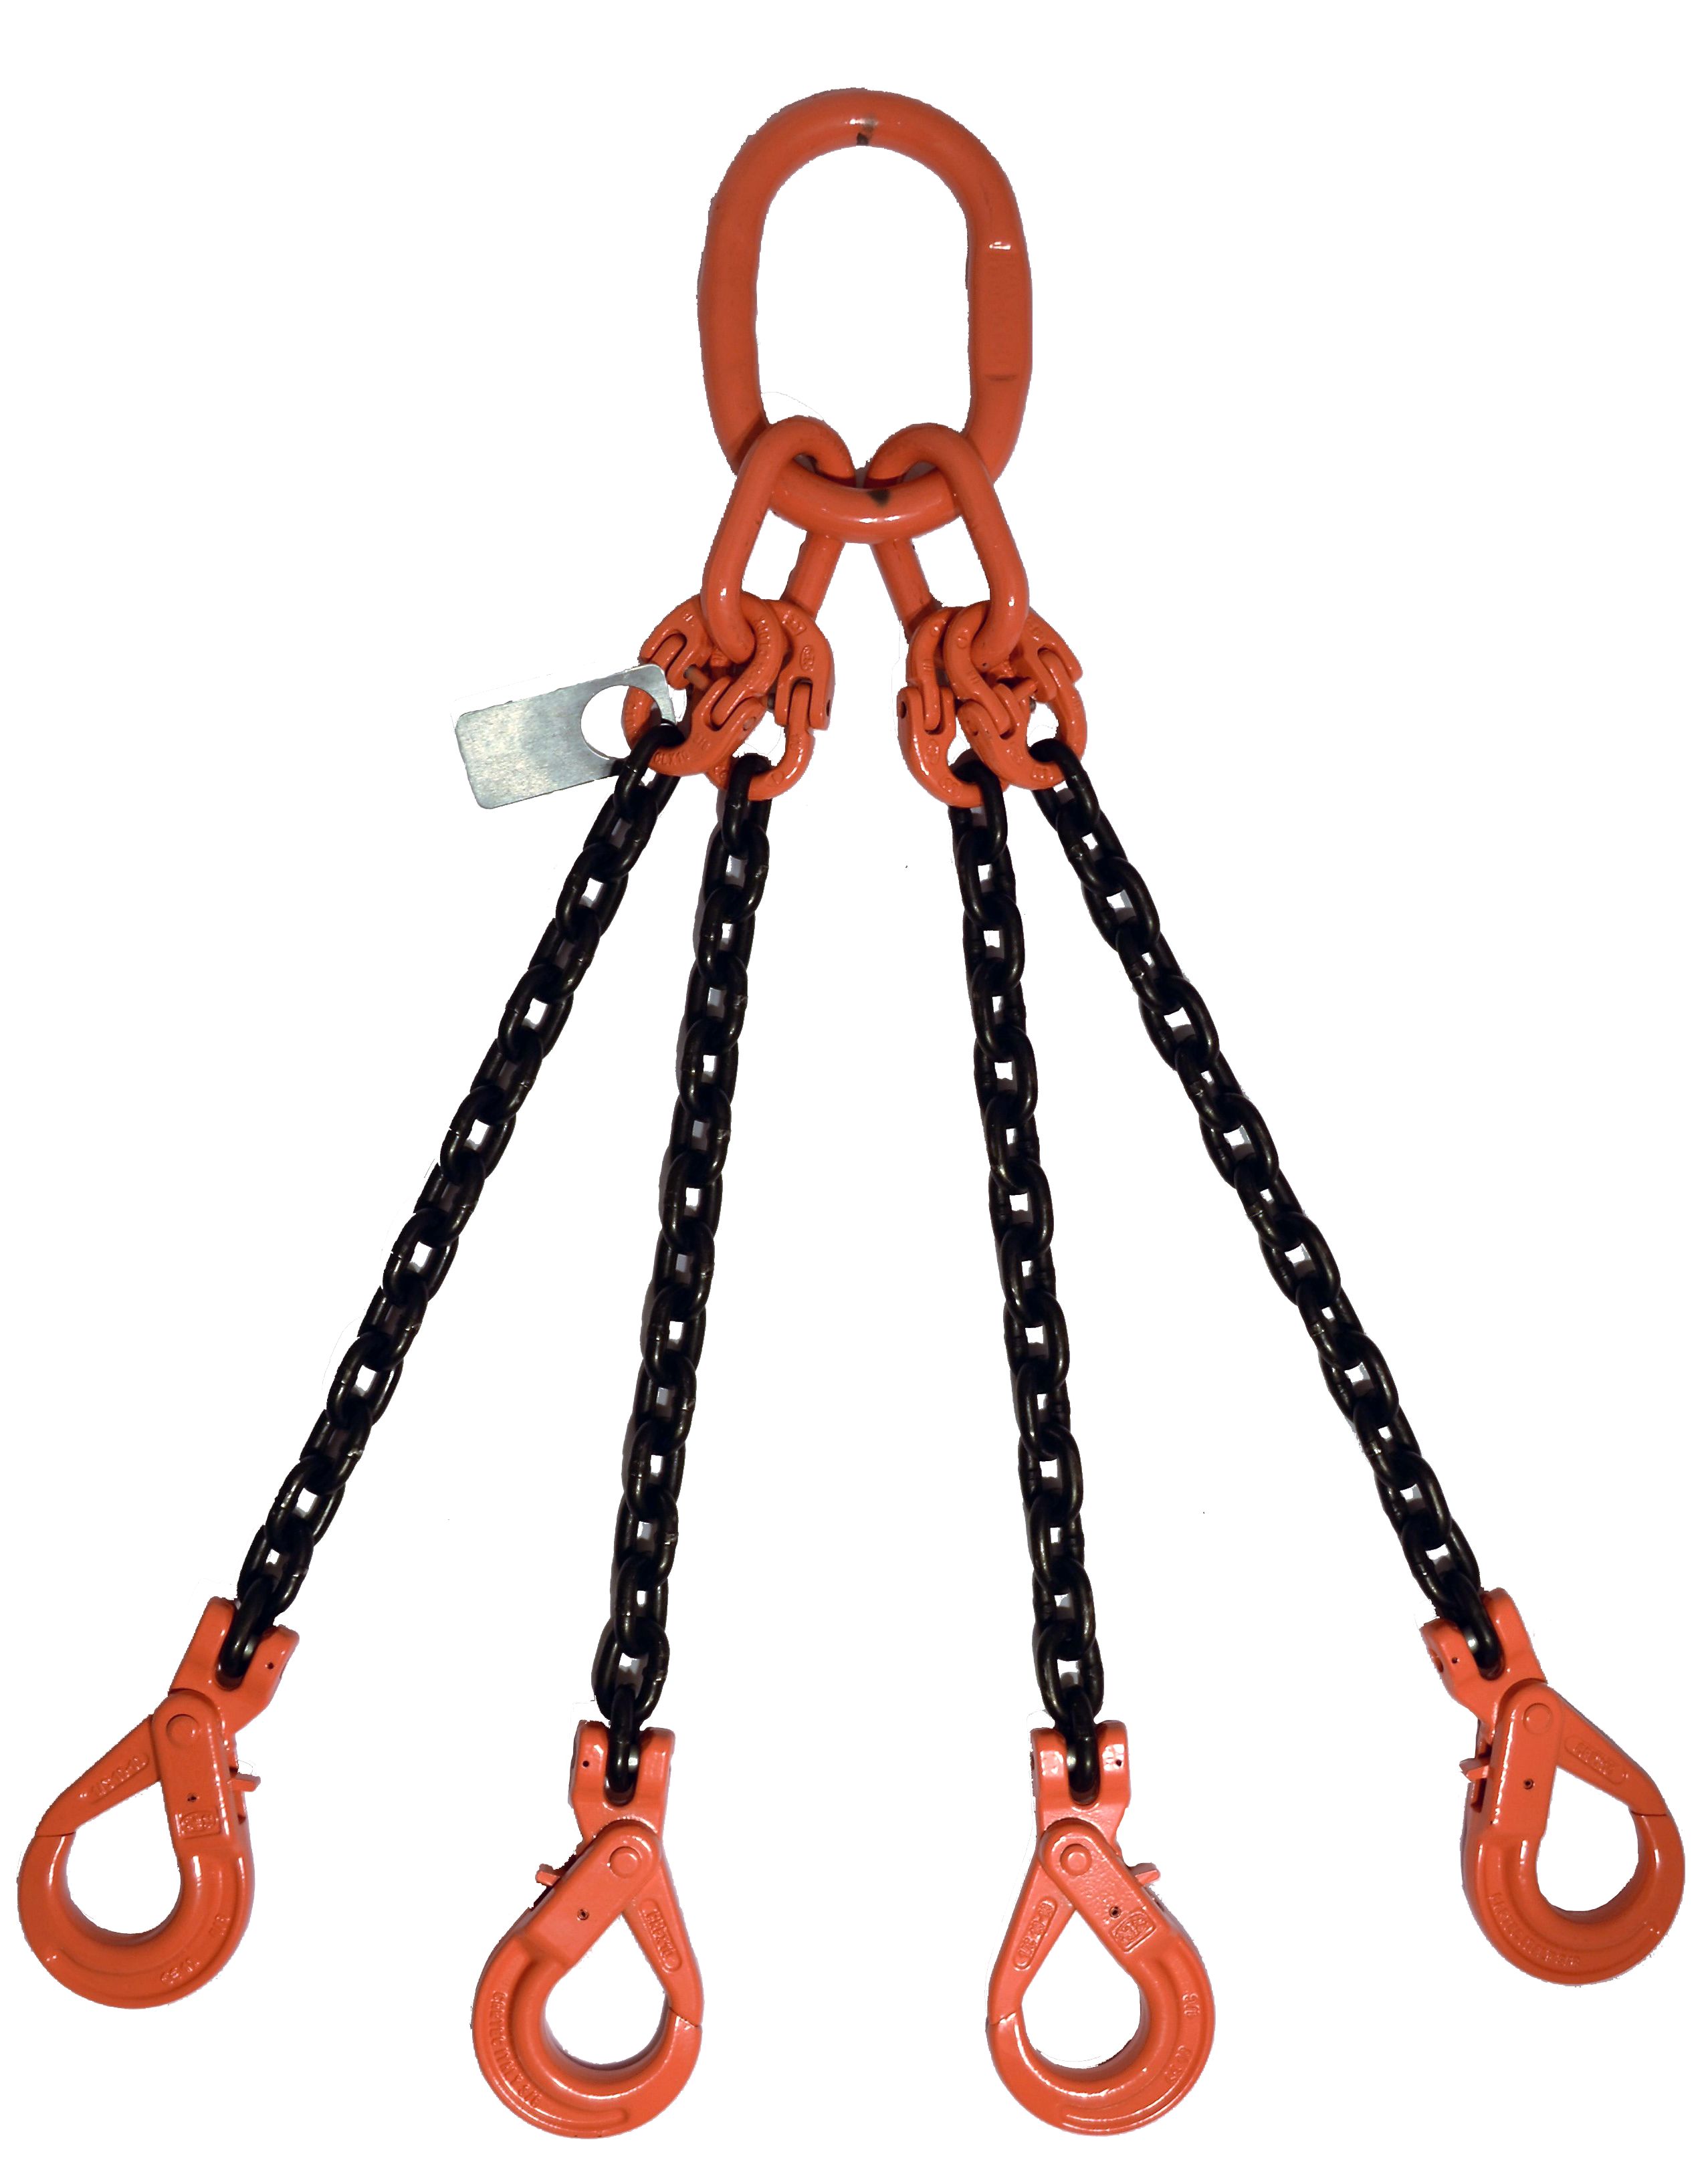 QOSL GR-100 Chain Sling